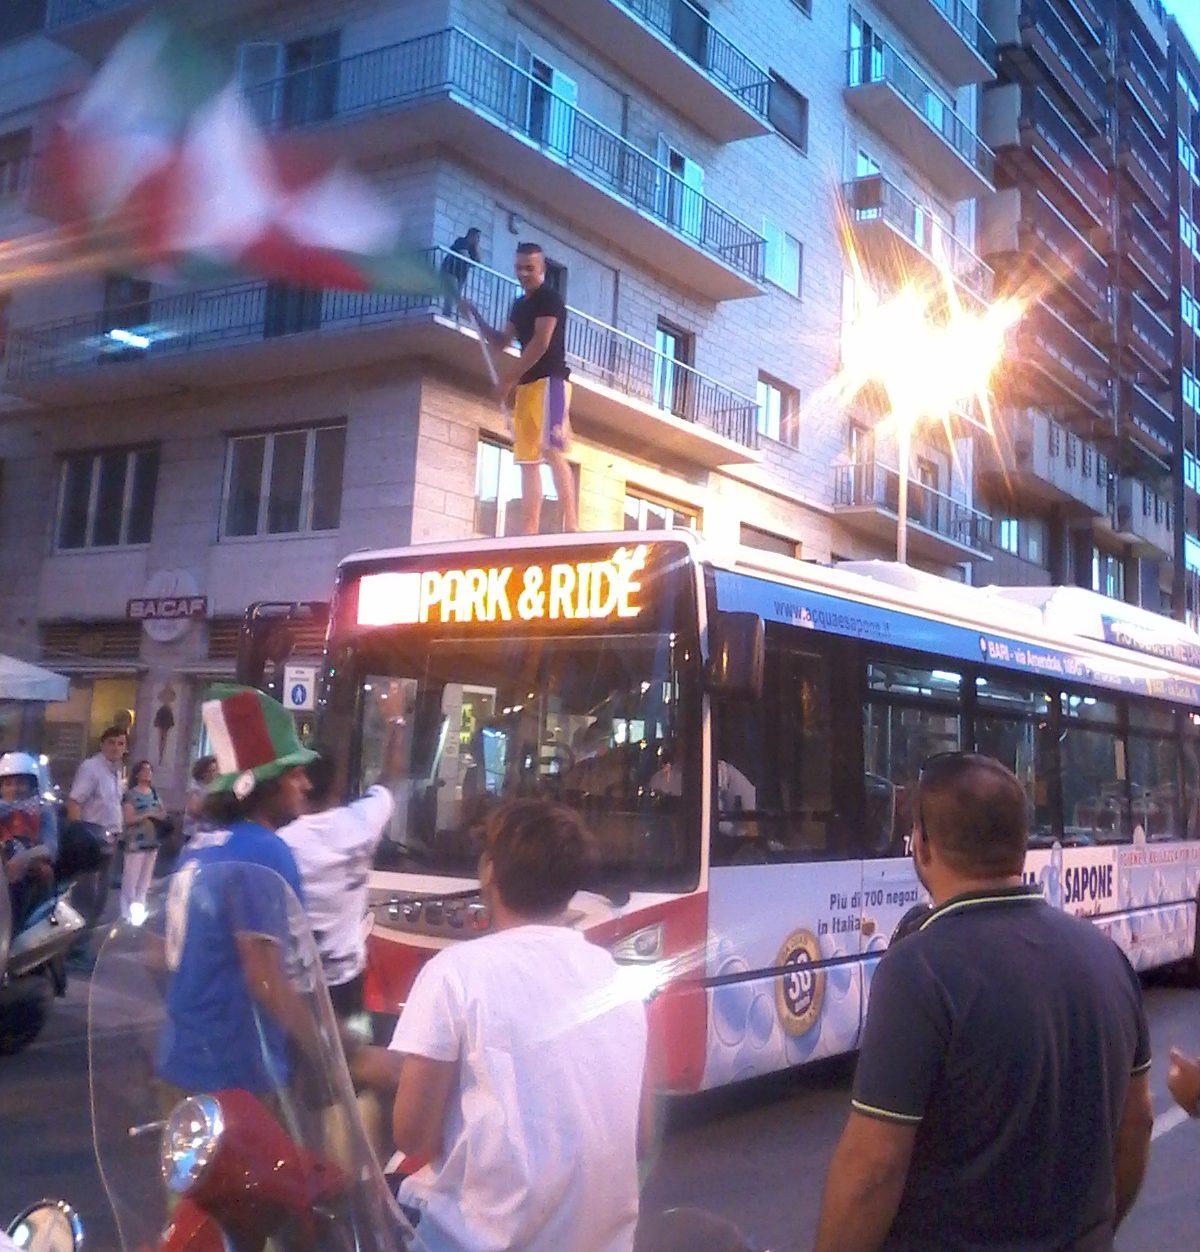 Tifoso festeggia sopra il Bus